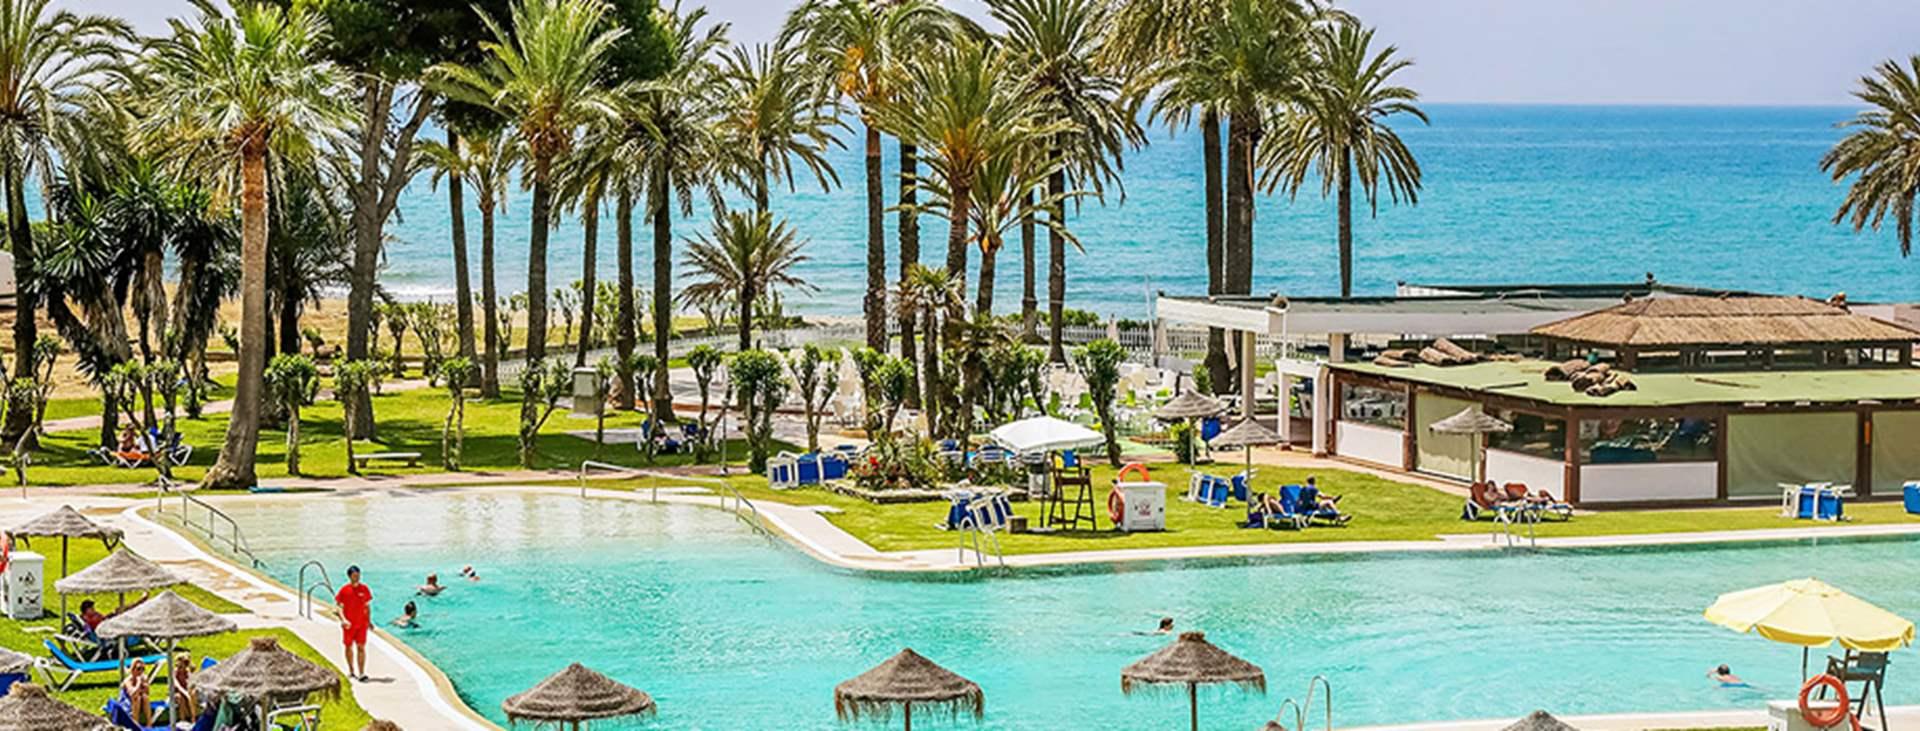 Hotelli Sol Marbella Estepona Atalaya Park Marbella Tjareborg